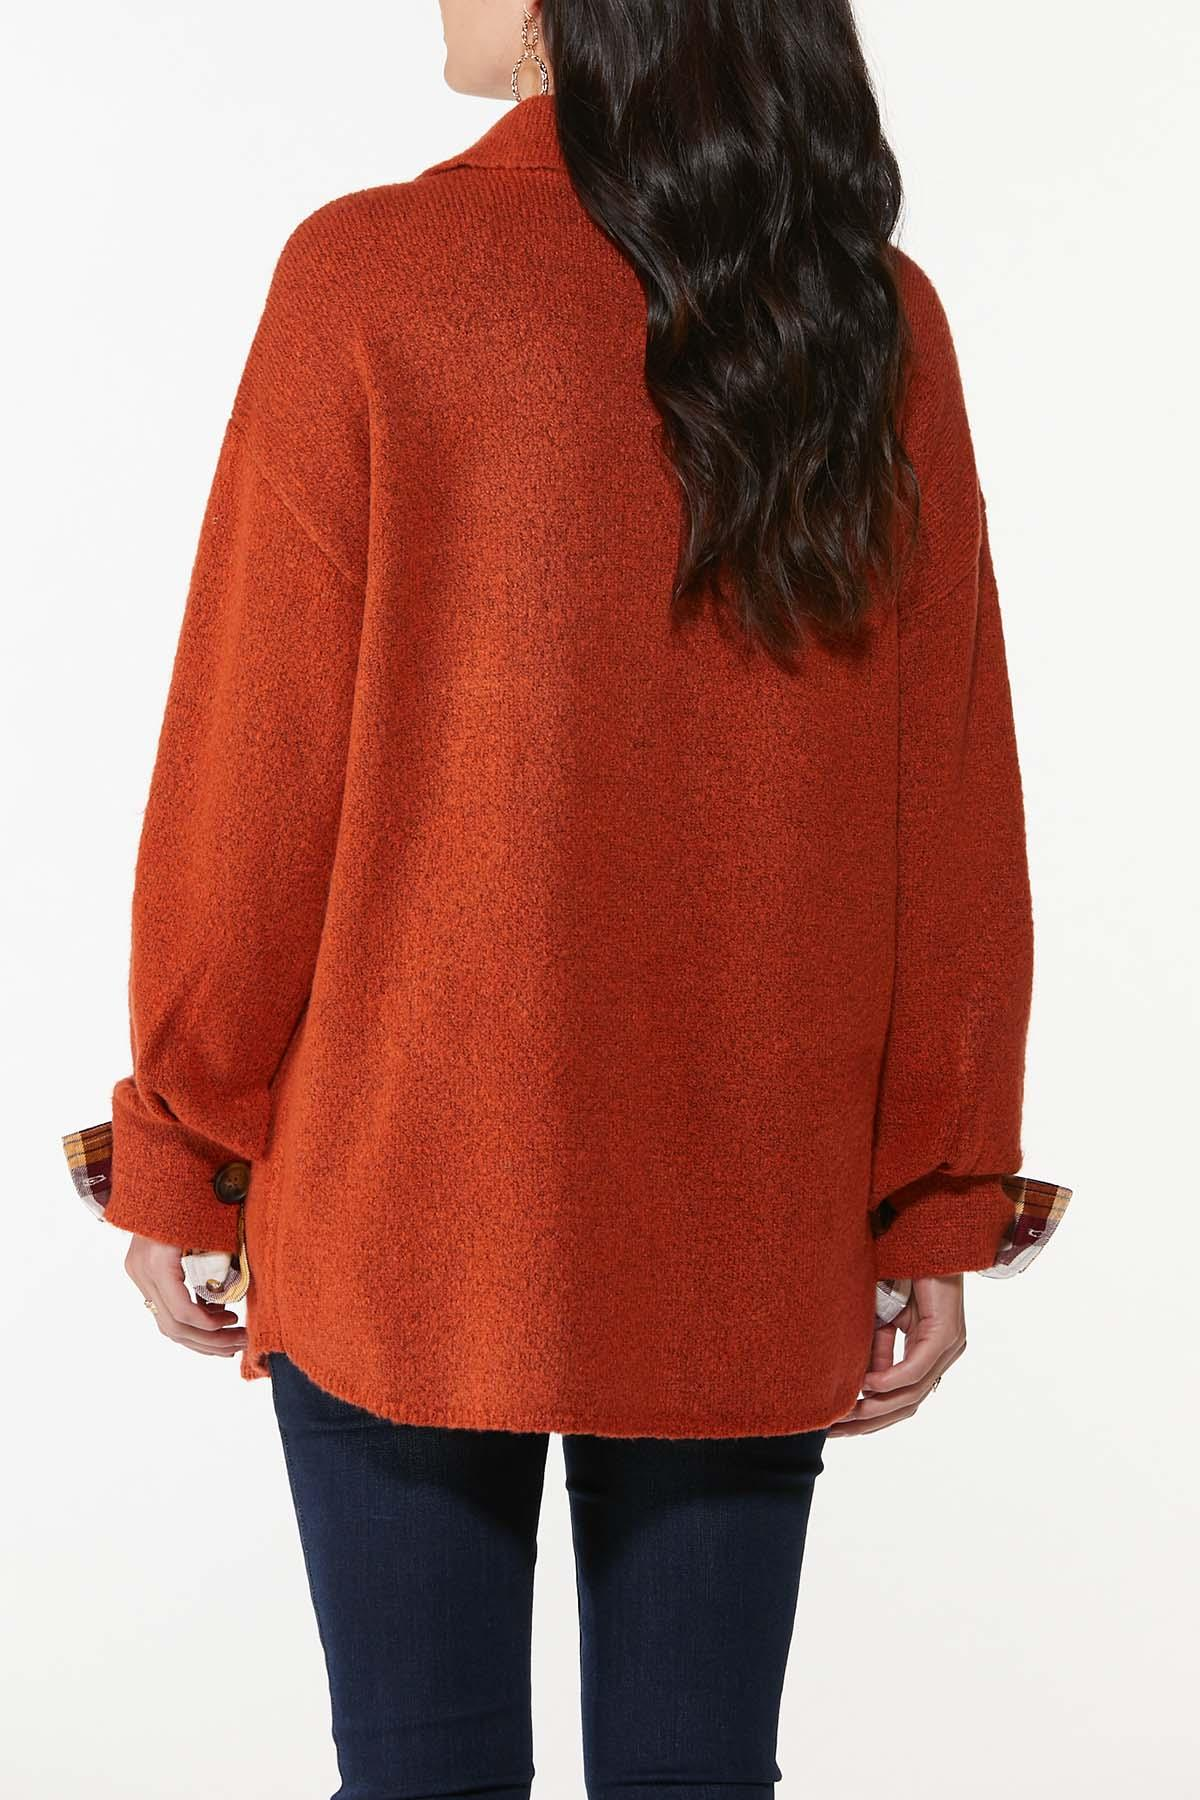 Fireside Cardigan Sweater (Item #44746225)